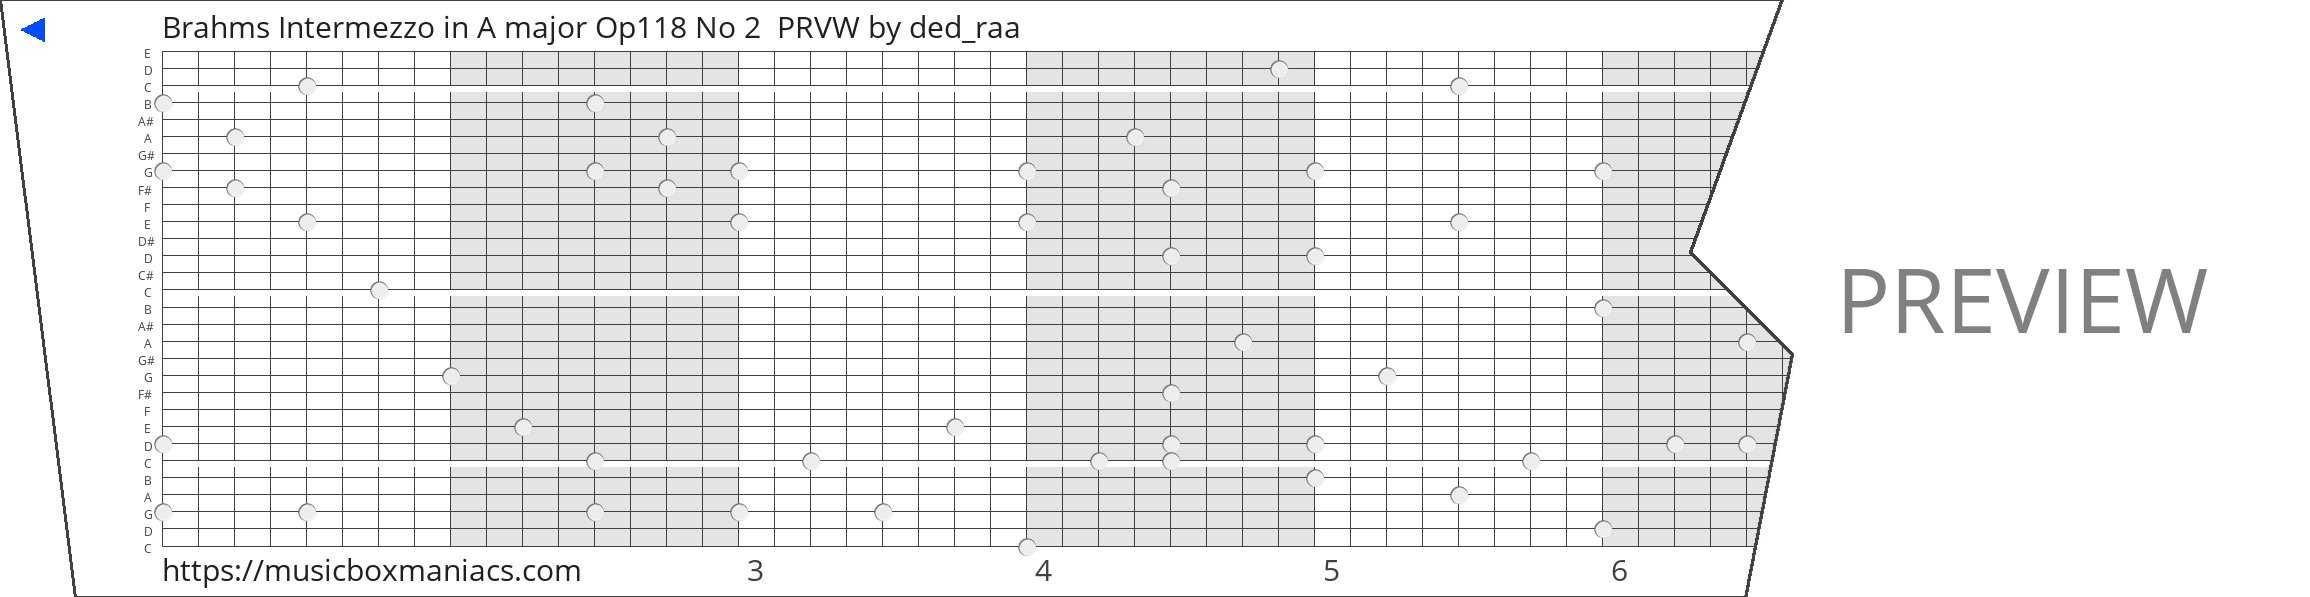 Brahms Intermezzo in A major Op118 No 2  PRVW 30 note music box paper strip